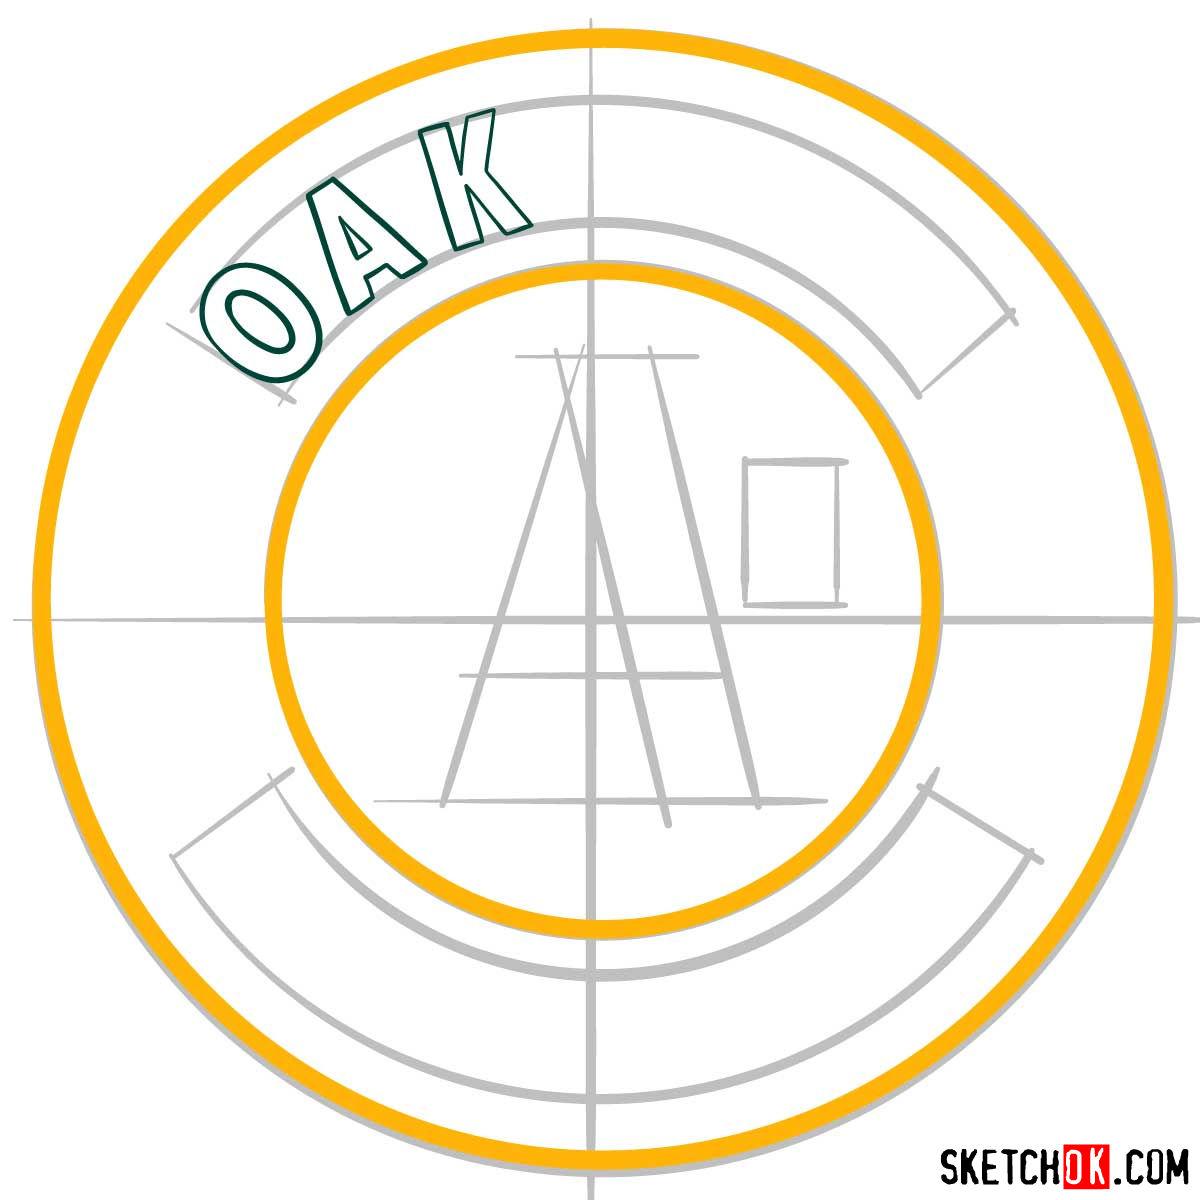 How to draw Oakland Athletics logo | MLB logos - step 04